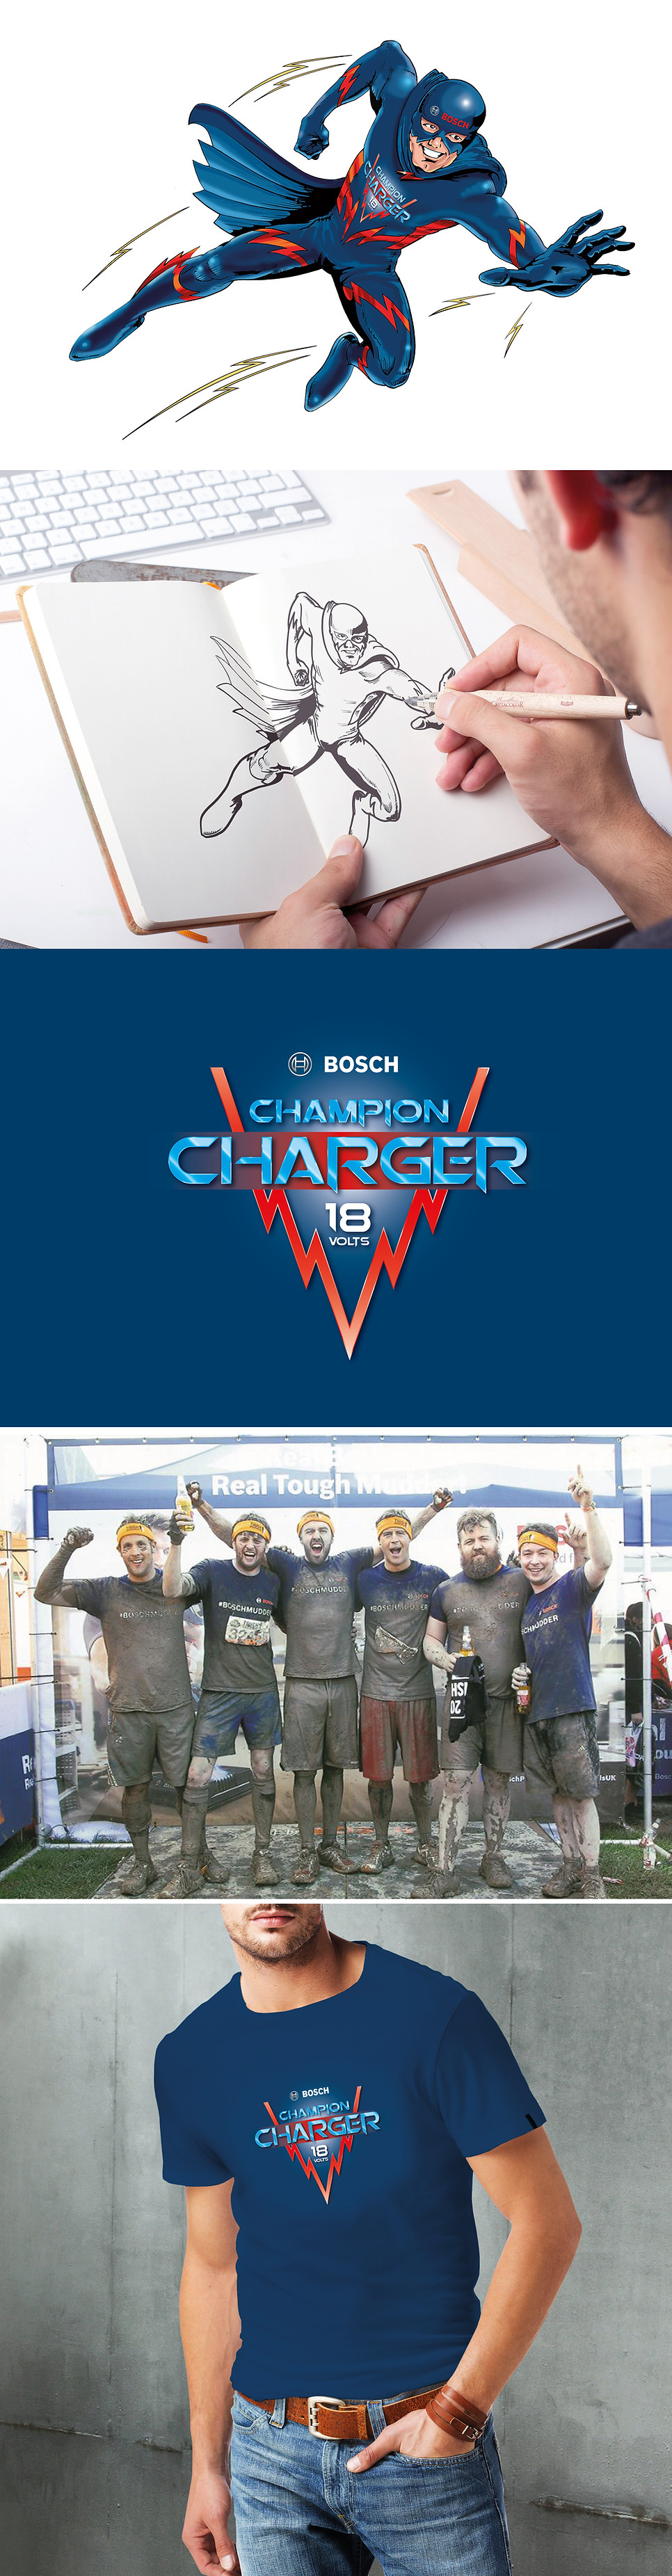 Bosch_Champion-Charger.jpg